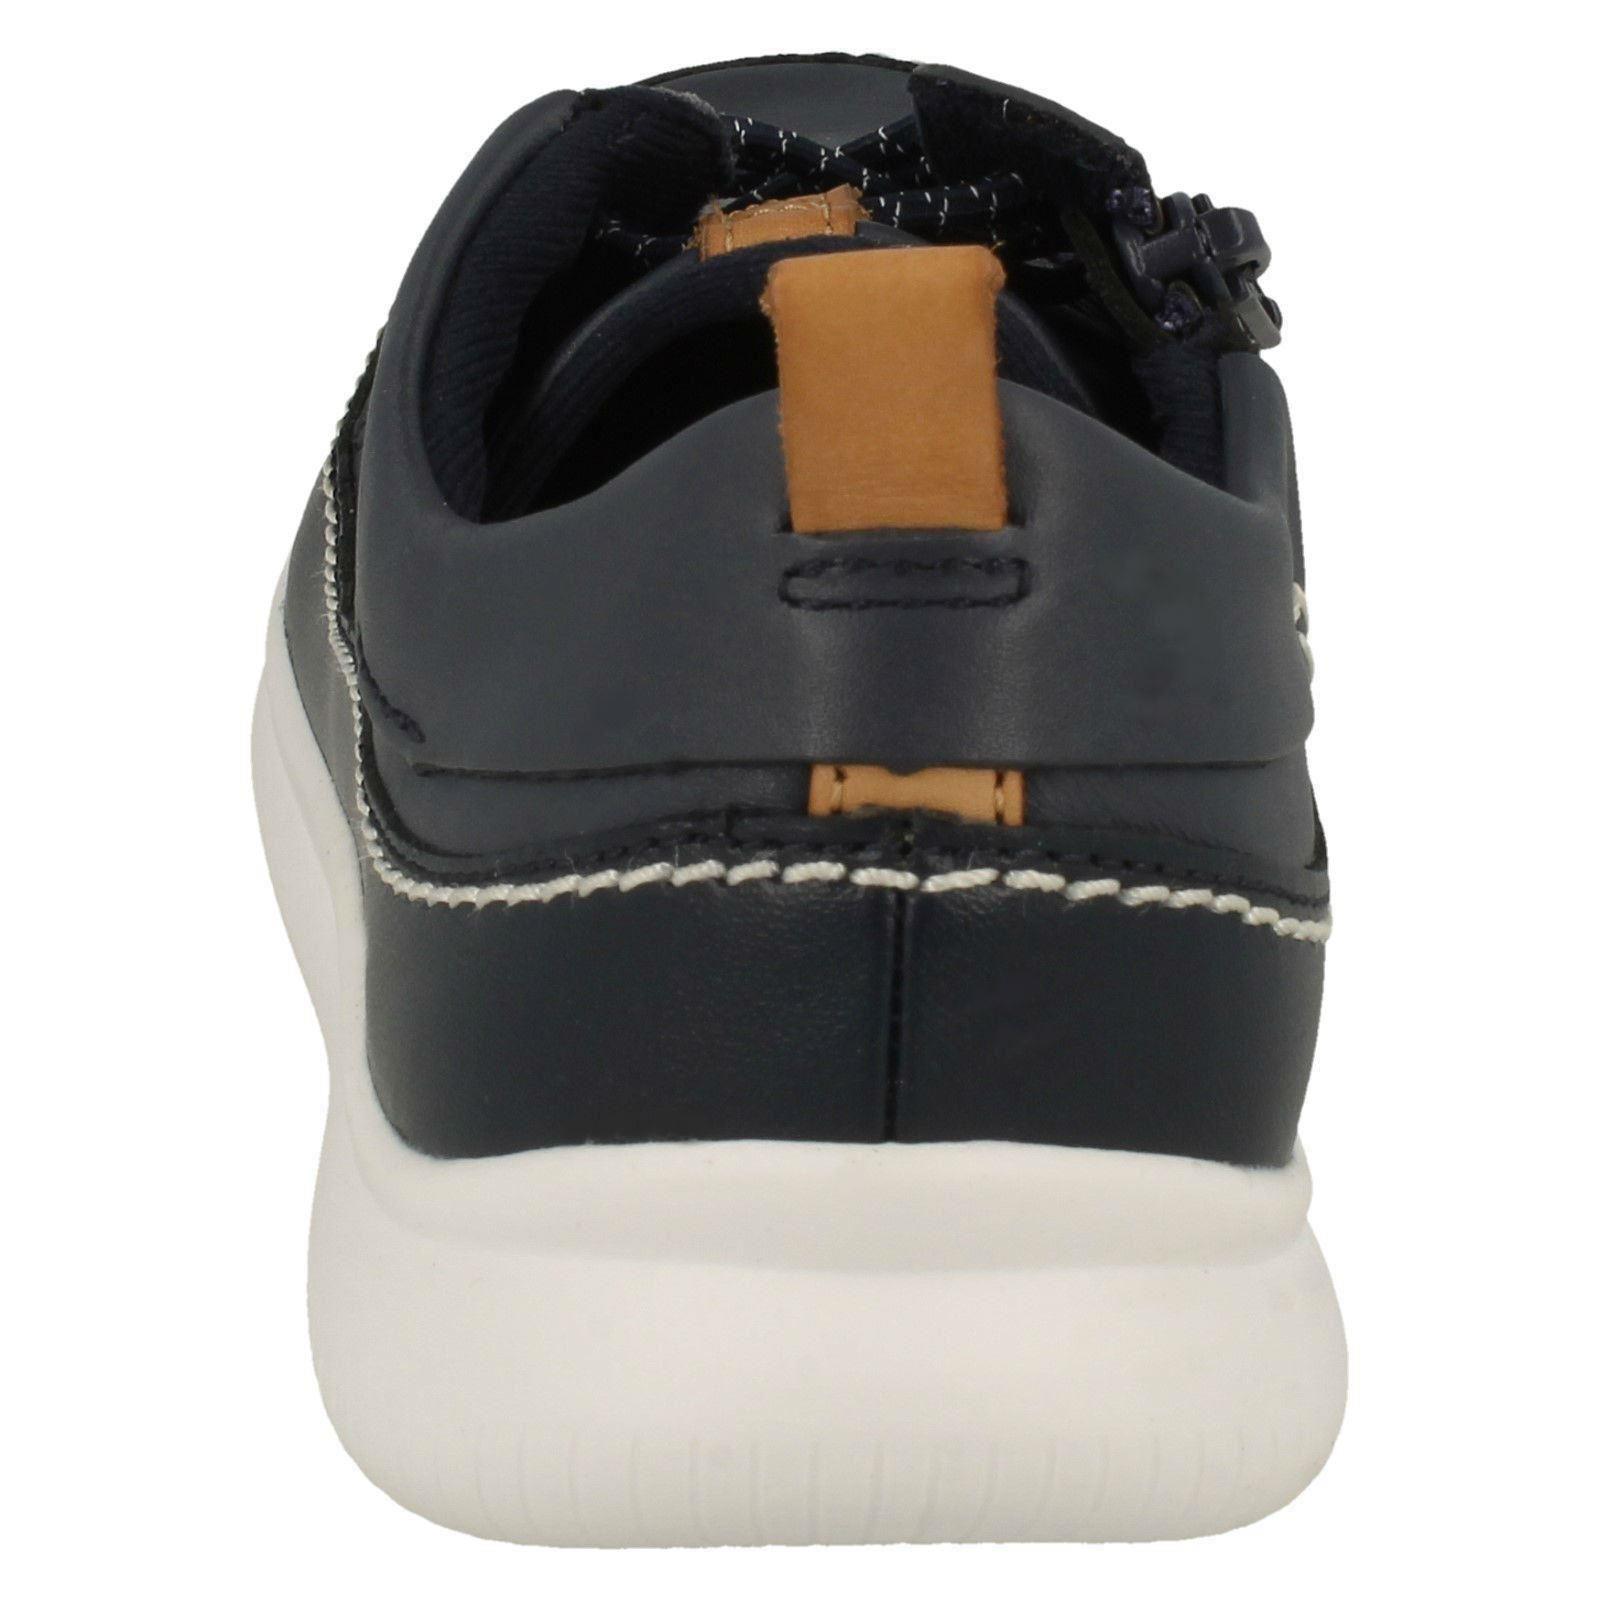 Cloud Chicos Elasticated Lace Clarks Zip Casual azul Detallado Up Zapatos Navy Leather Blaze qzqBO